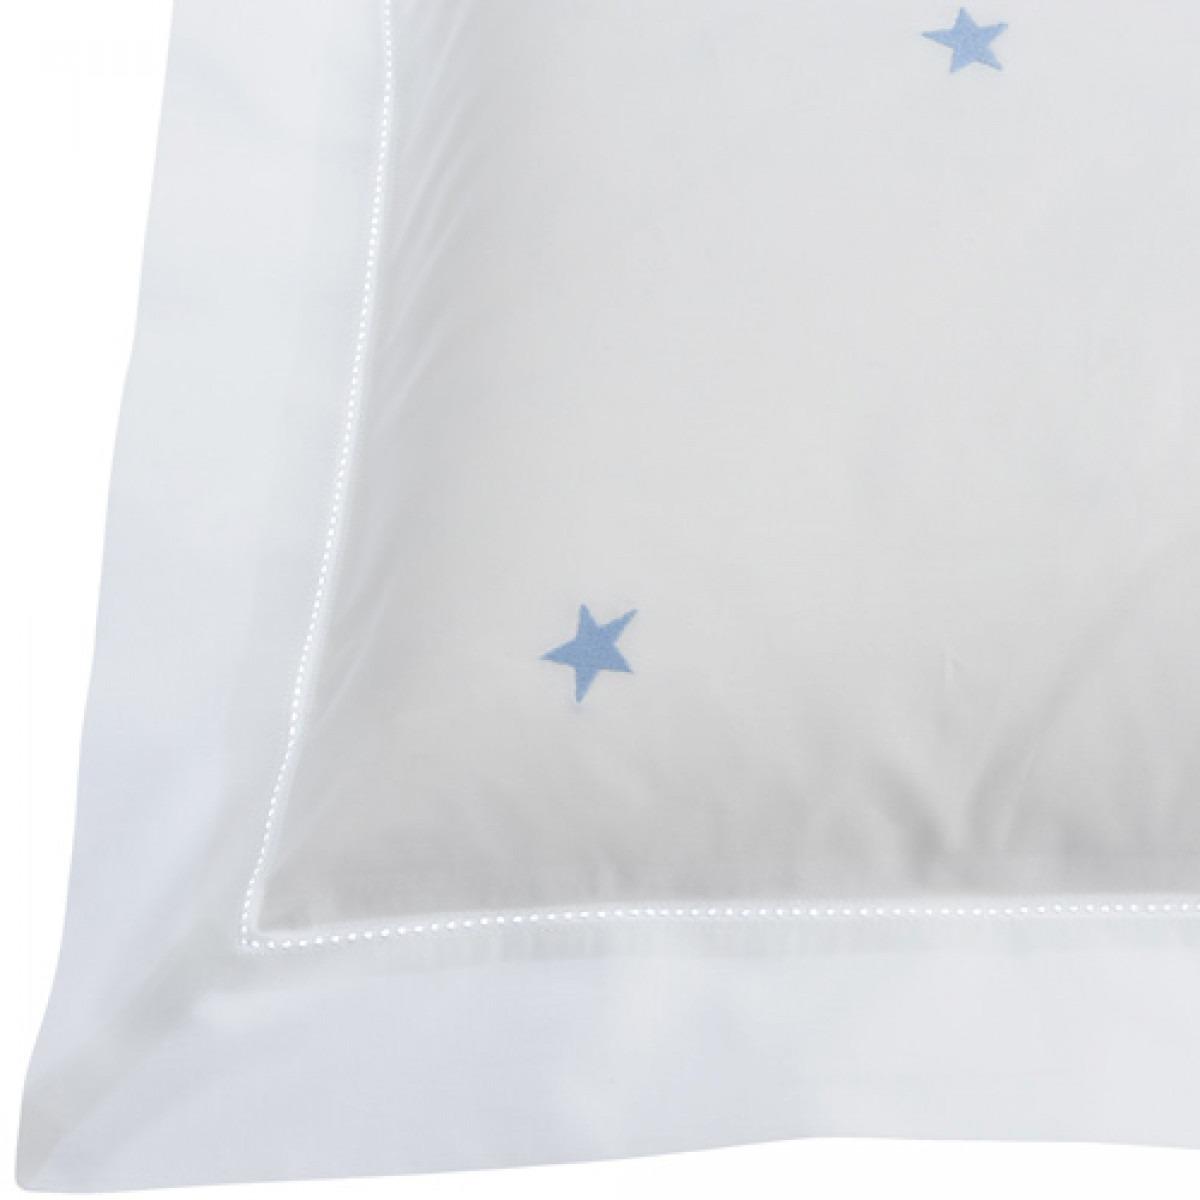 Children's Starry Embroidered Bedlinen